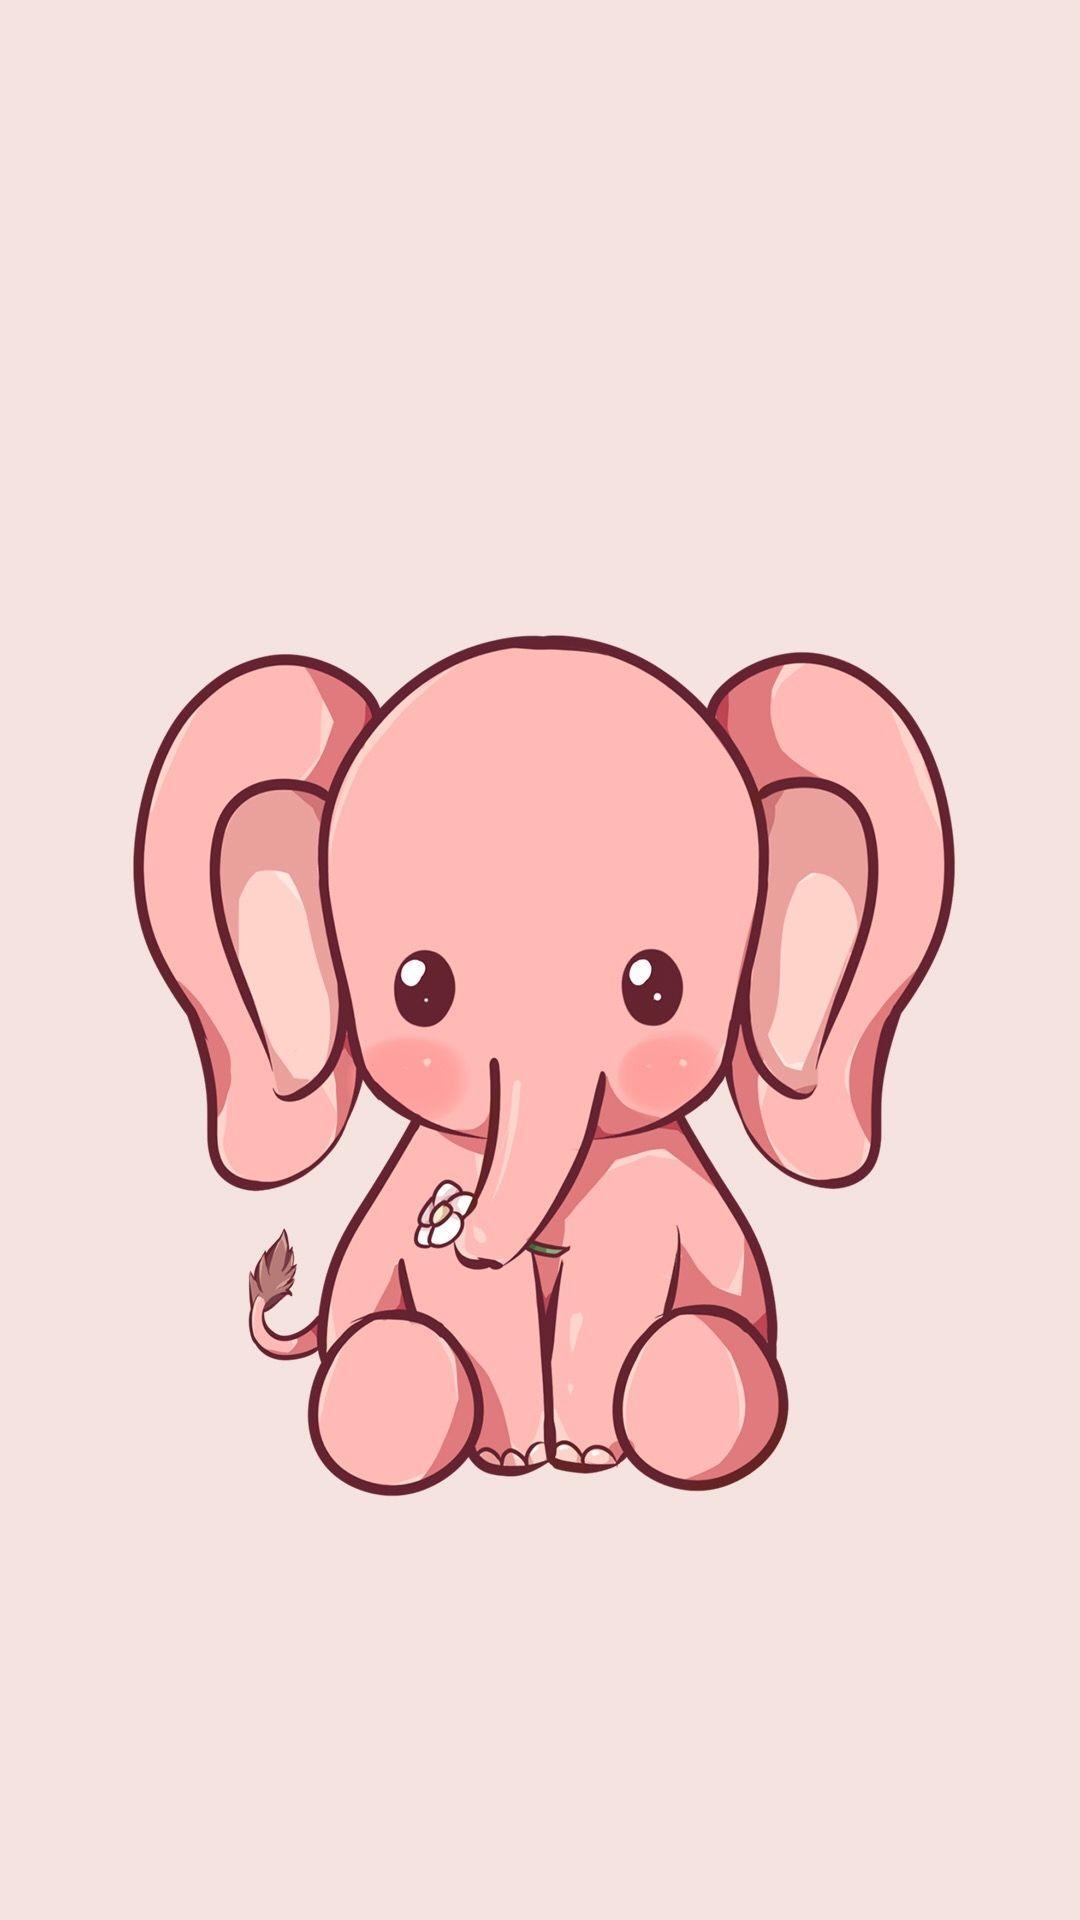 Cartoon Elephant Wallpapers Top Free Cartoon Elephant Backgrounds Wallpaperaccess